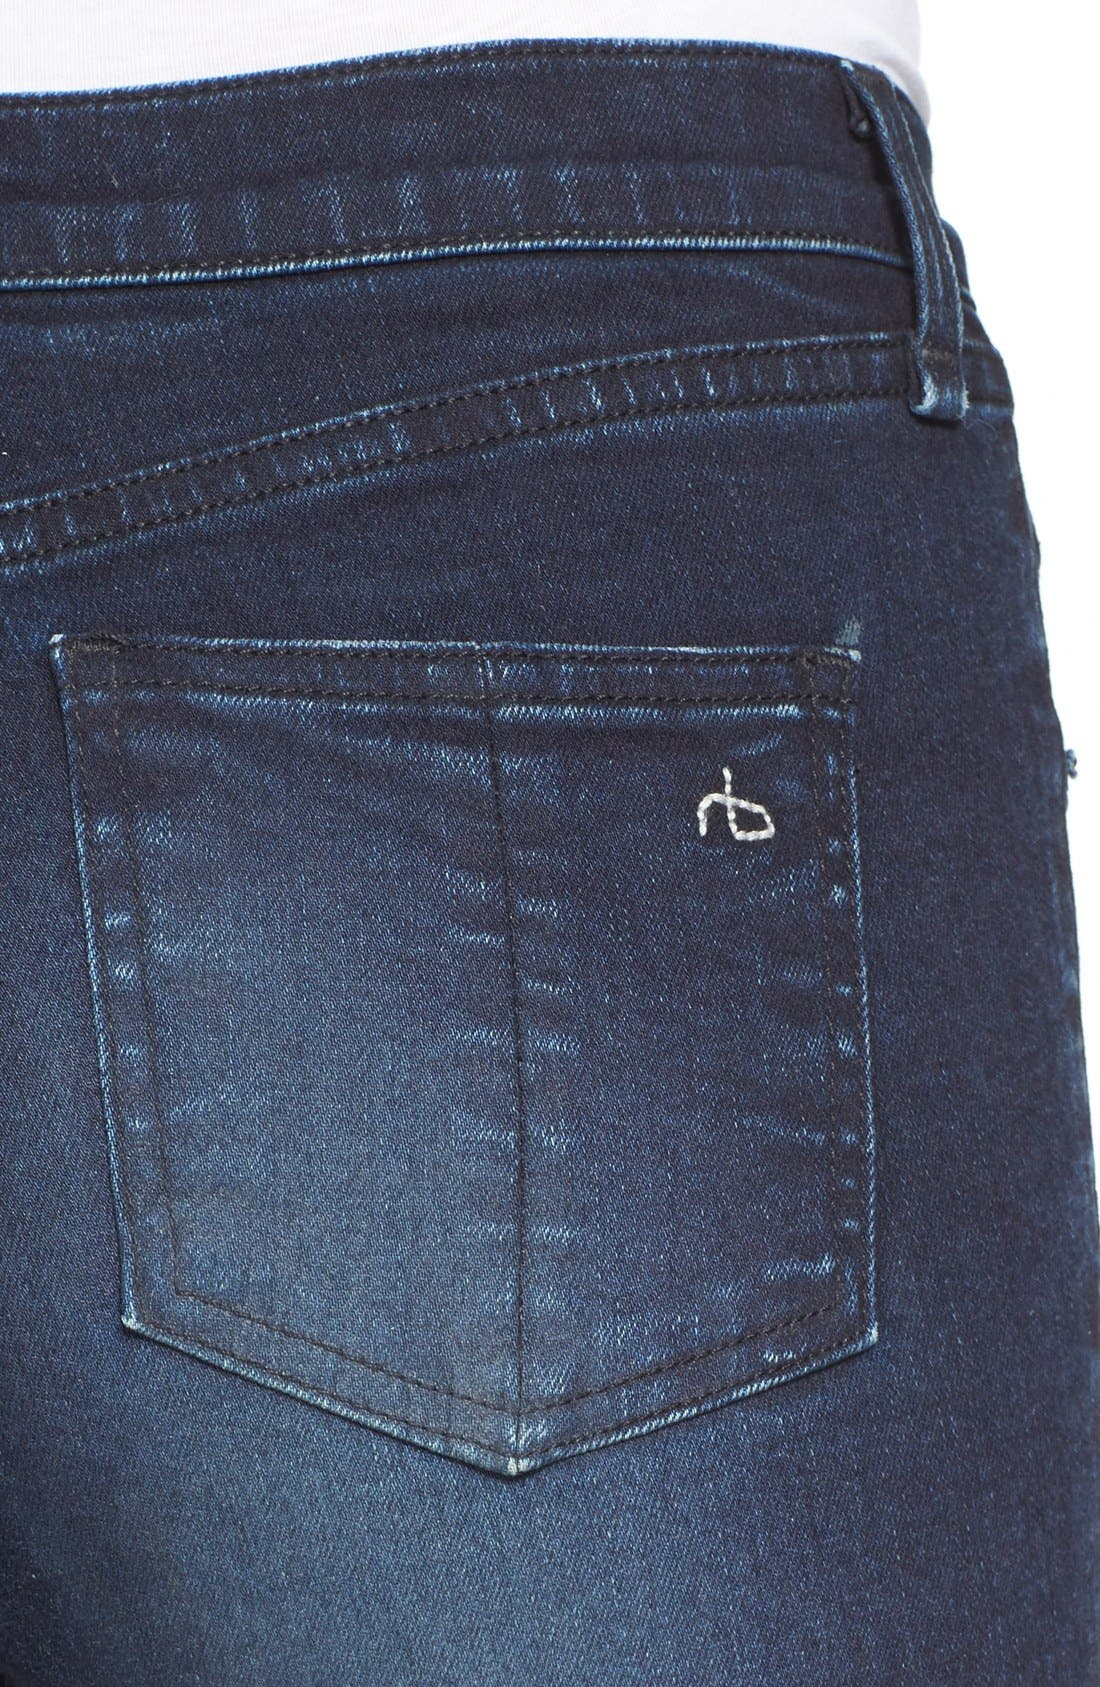 High Rise Skinny Jeans,                             Alternate thumbnail 2, color,                             403